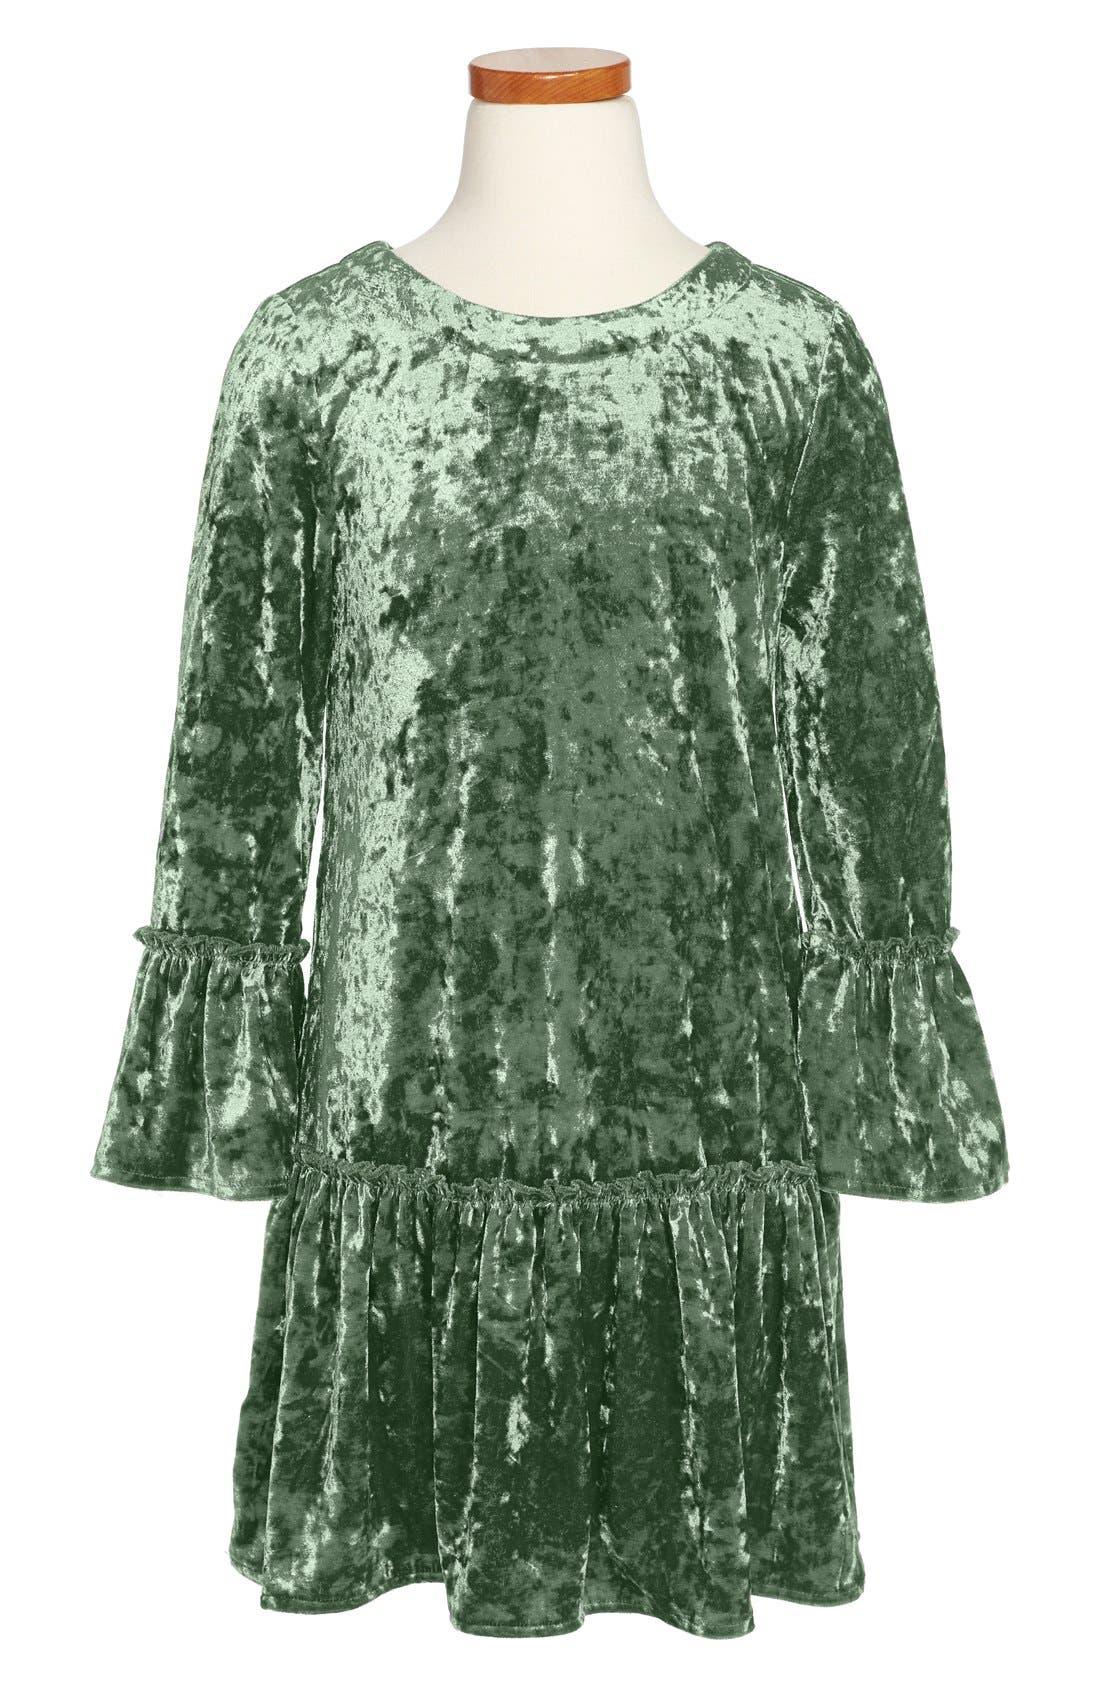 Main Image - Peek 'Anastasia' Crushed Velvet Dress (Toddler Girls, Little Girls & Big Girls)